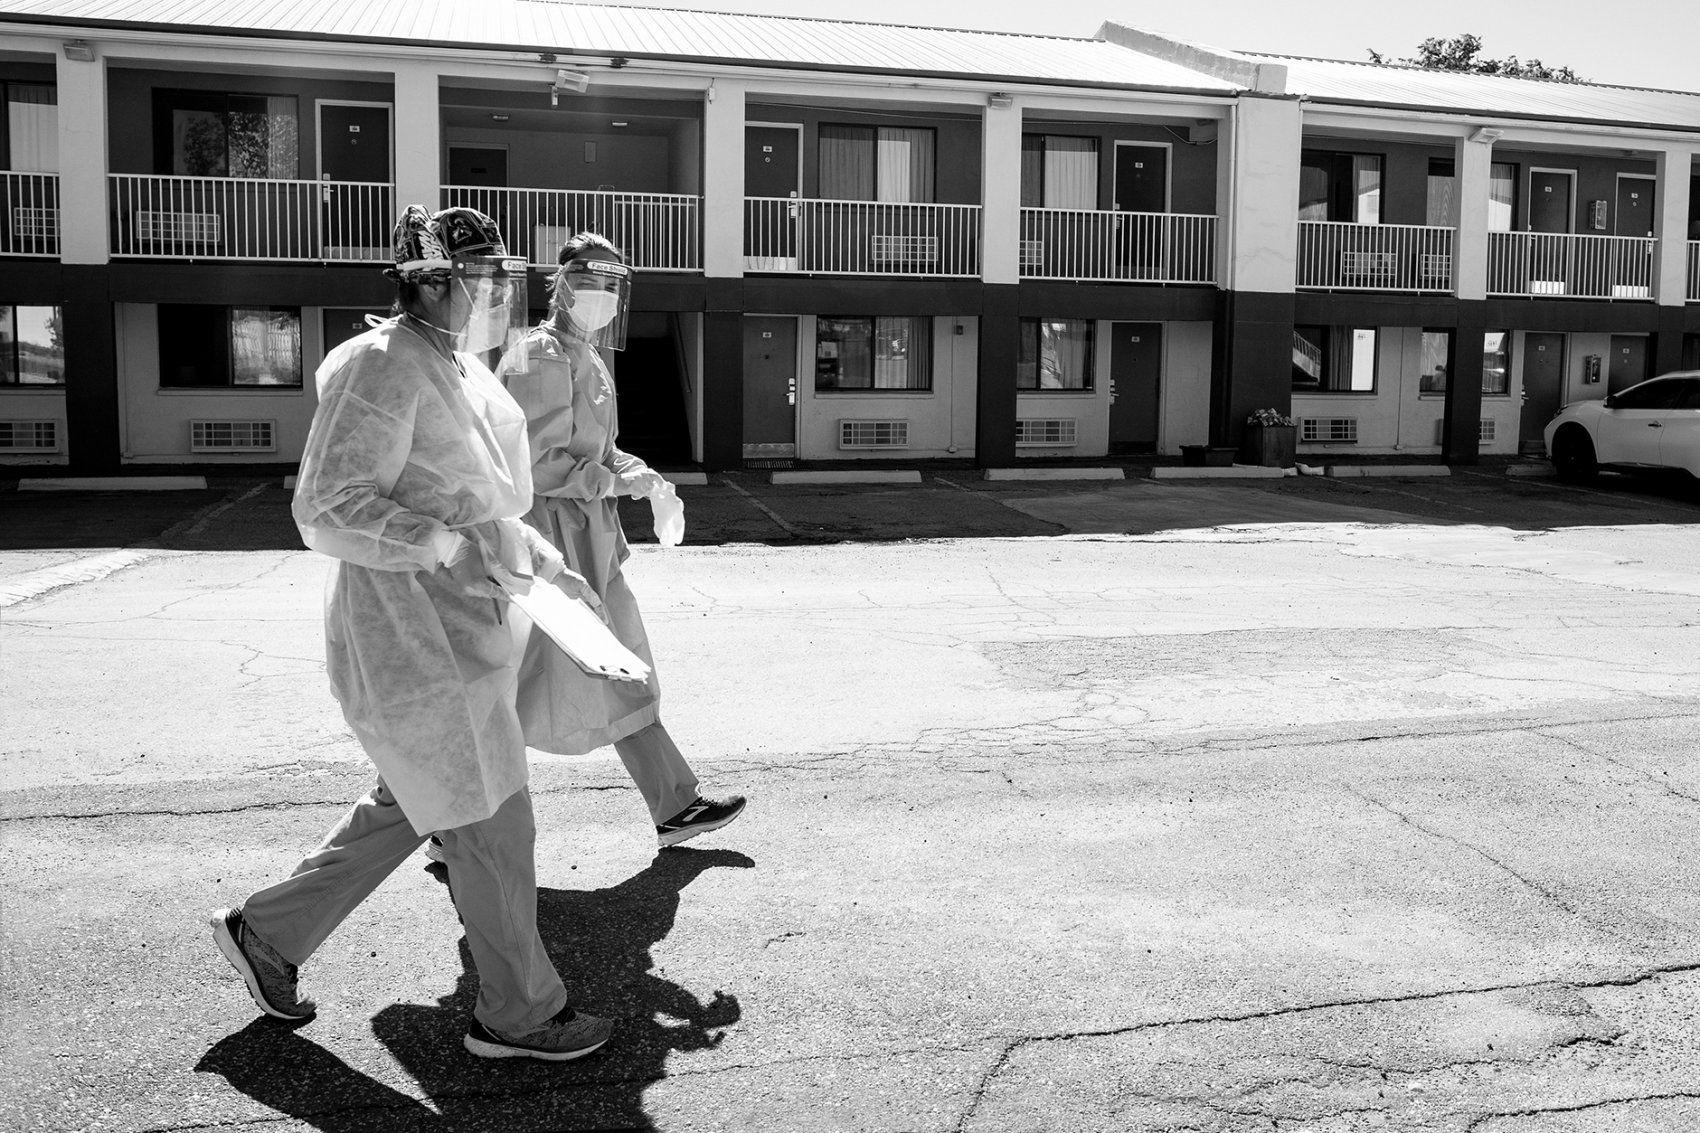 medical workers walk across a motel parking lot